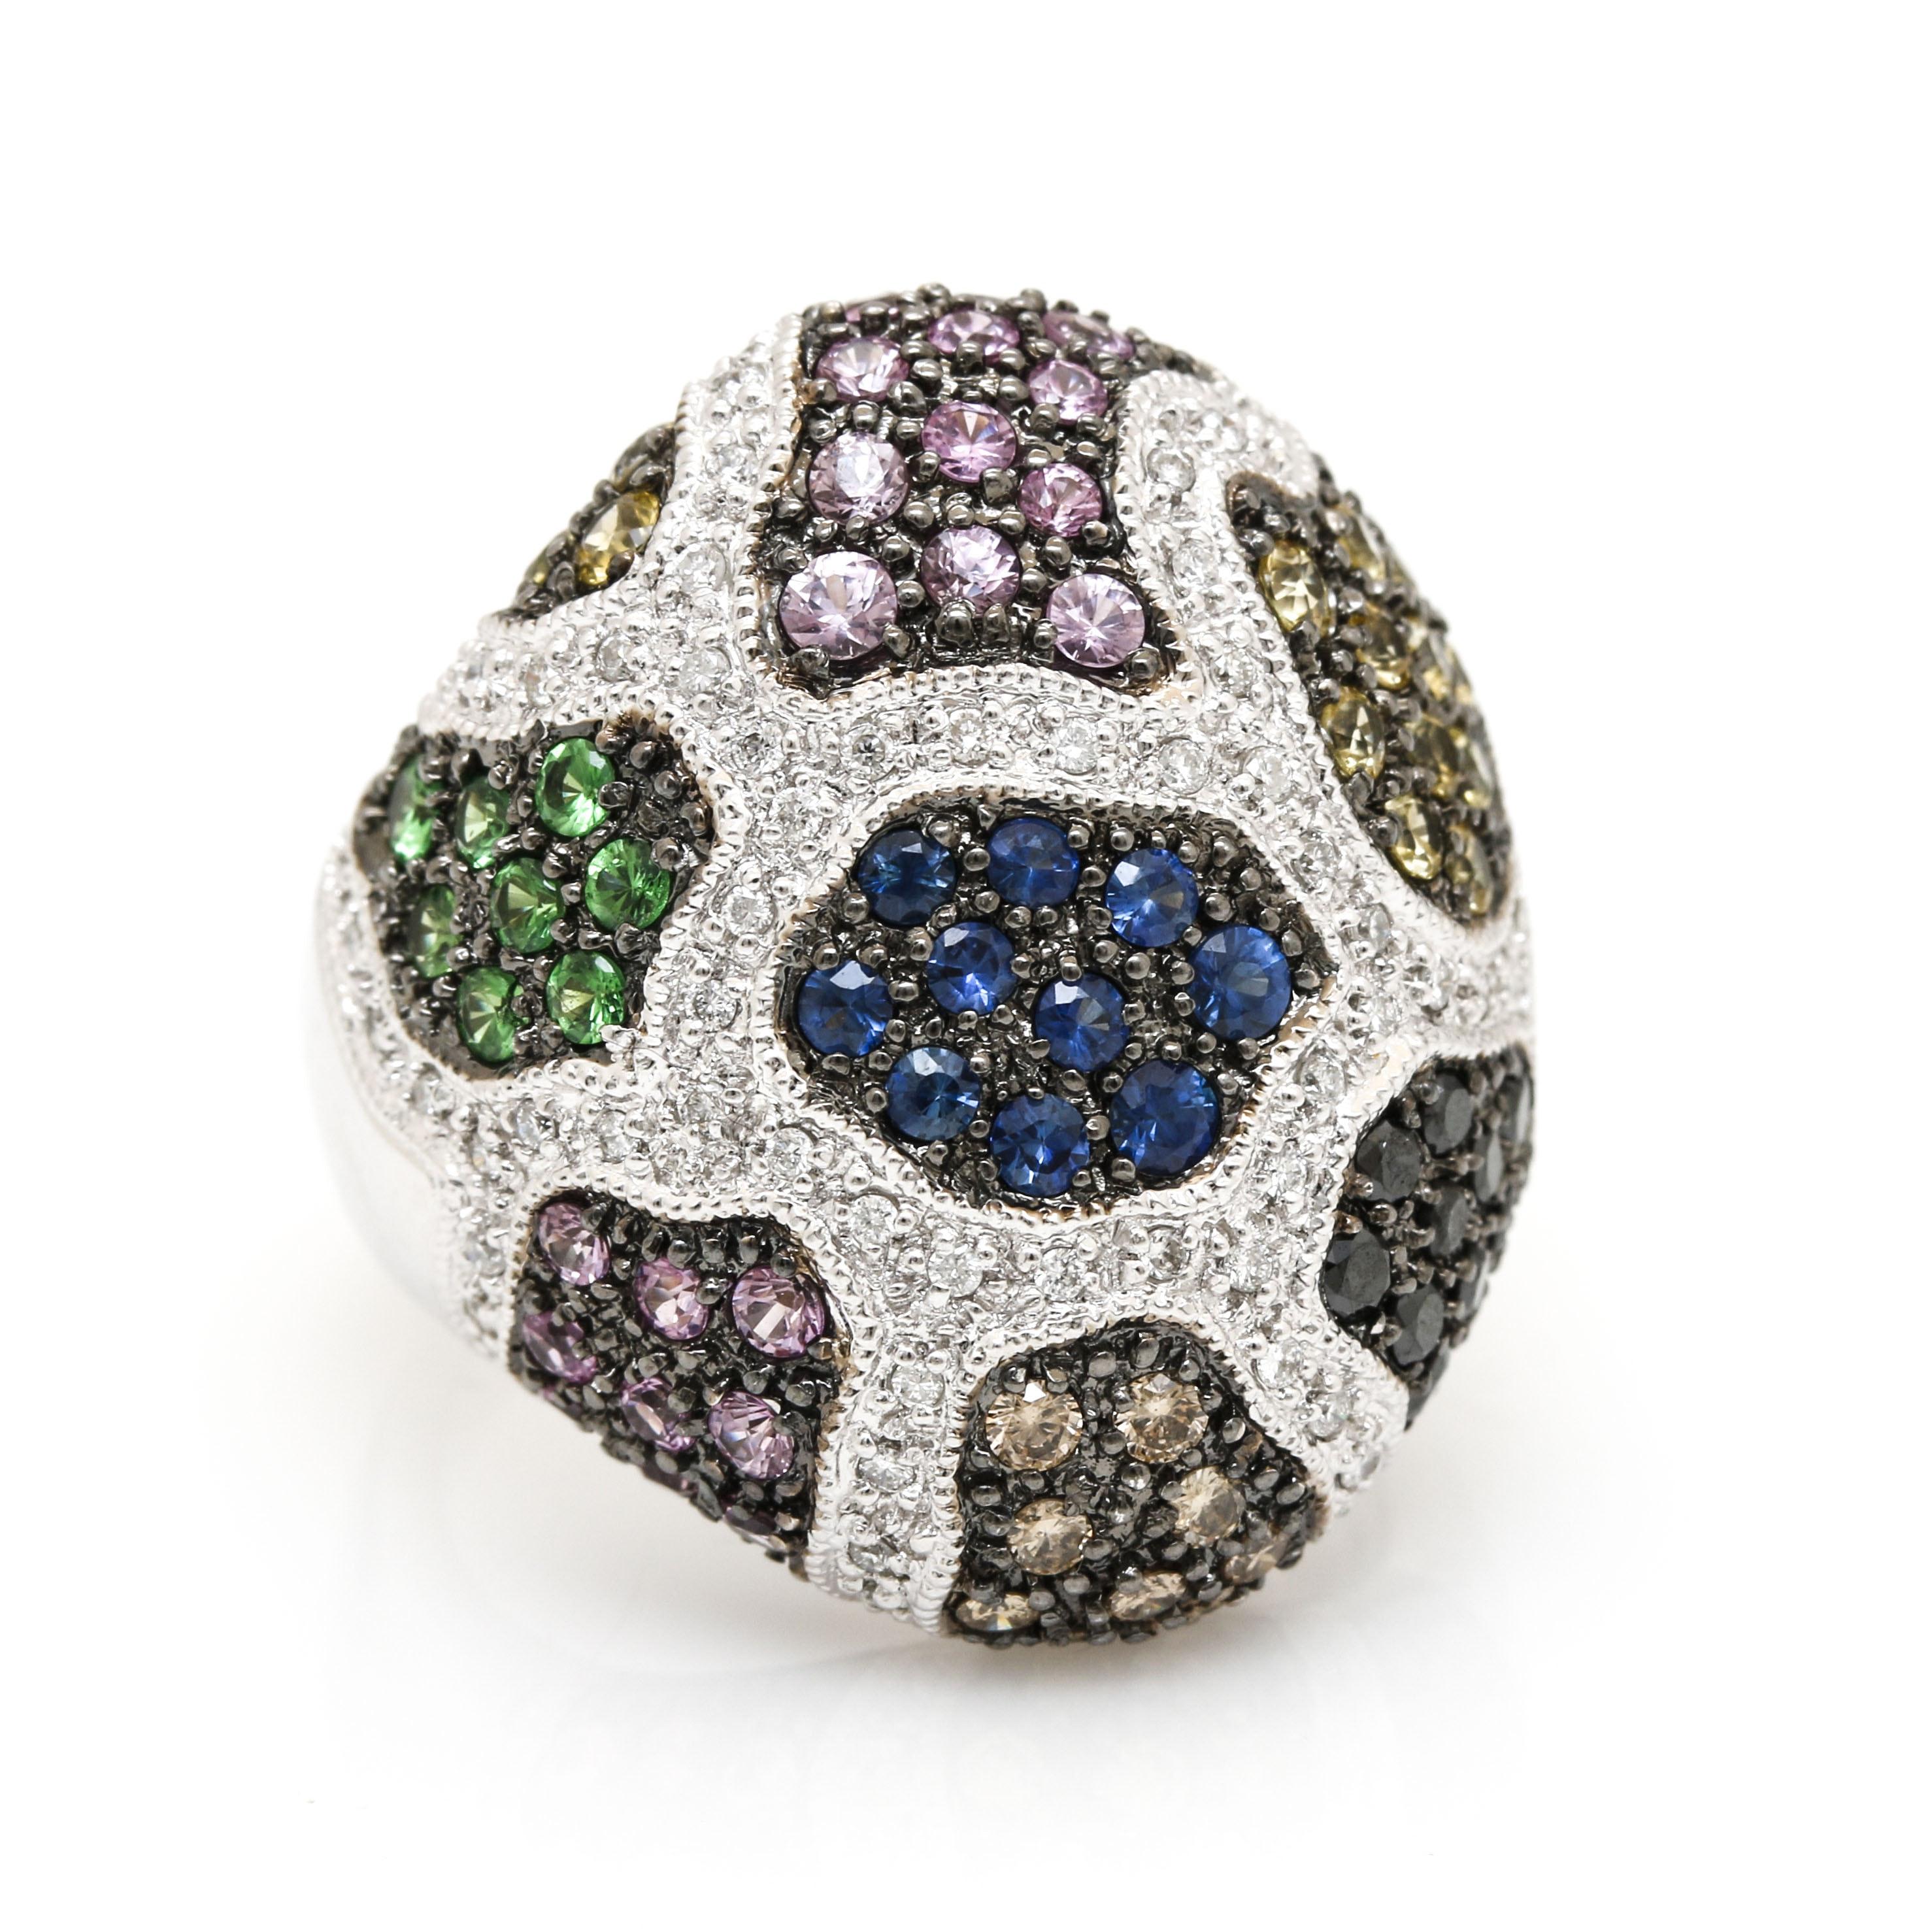 18K White Gold Gemstone and Diamond Ring